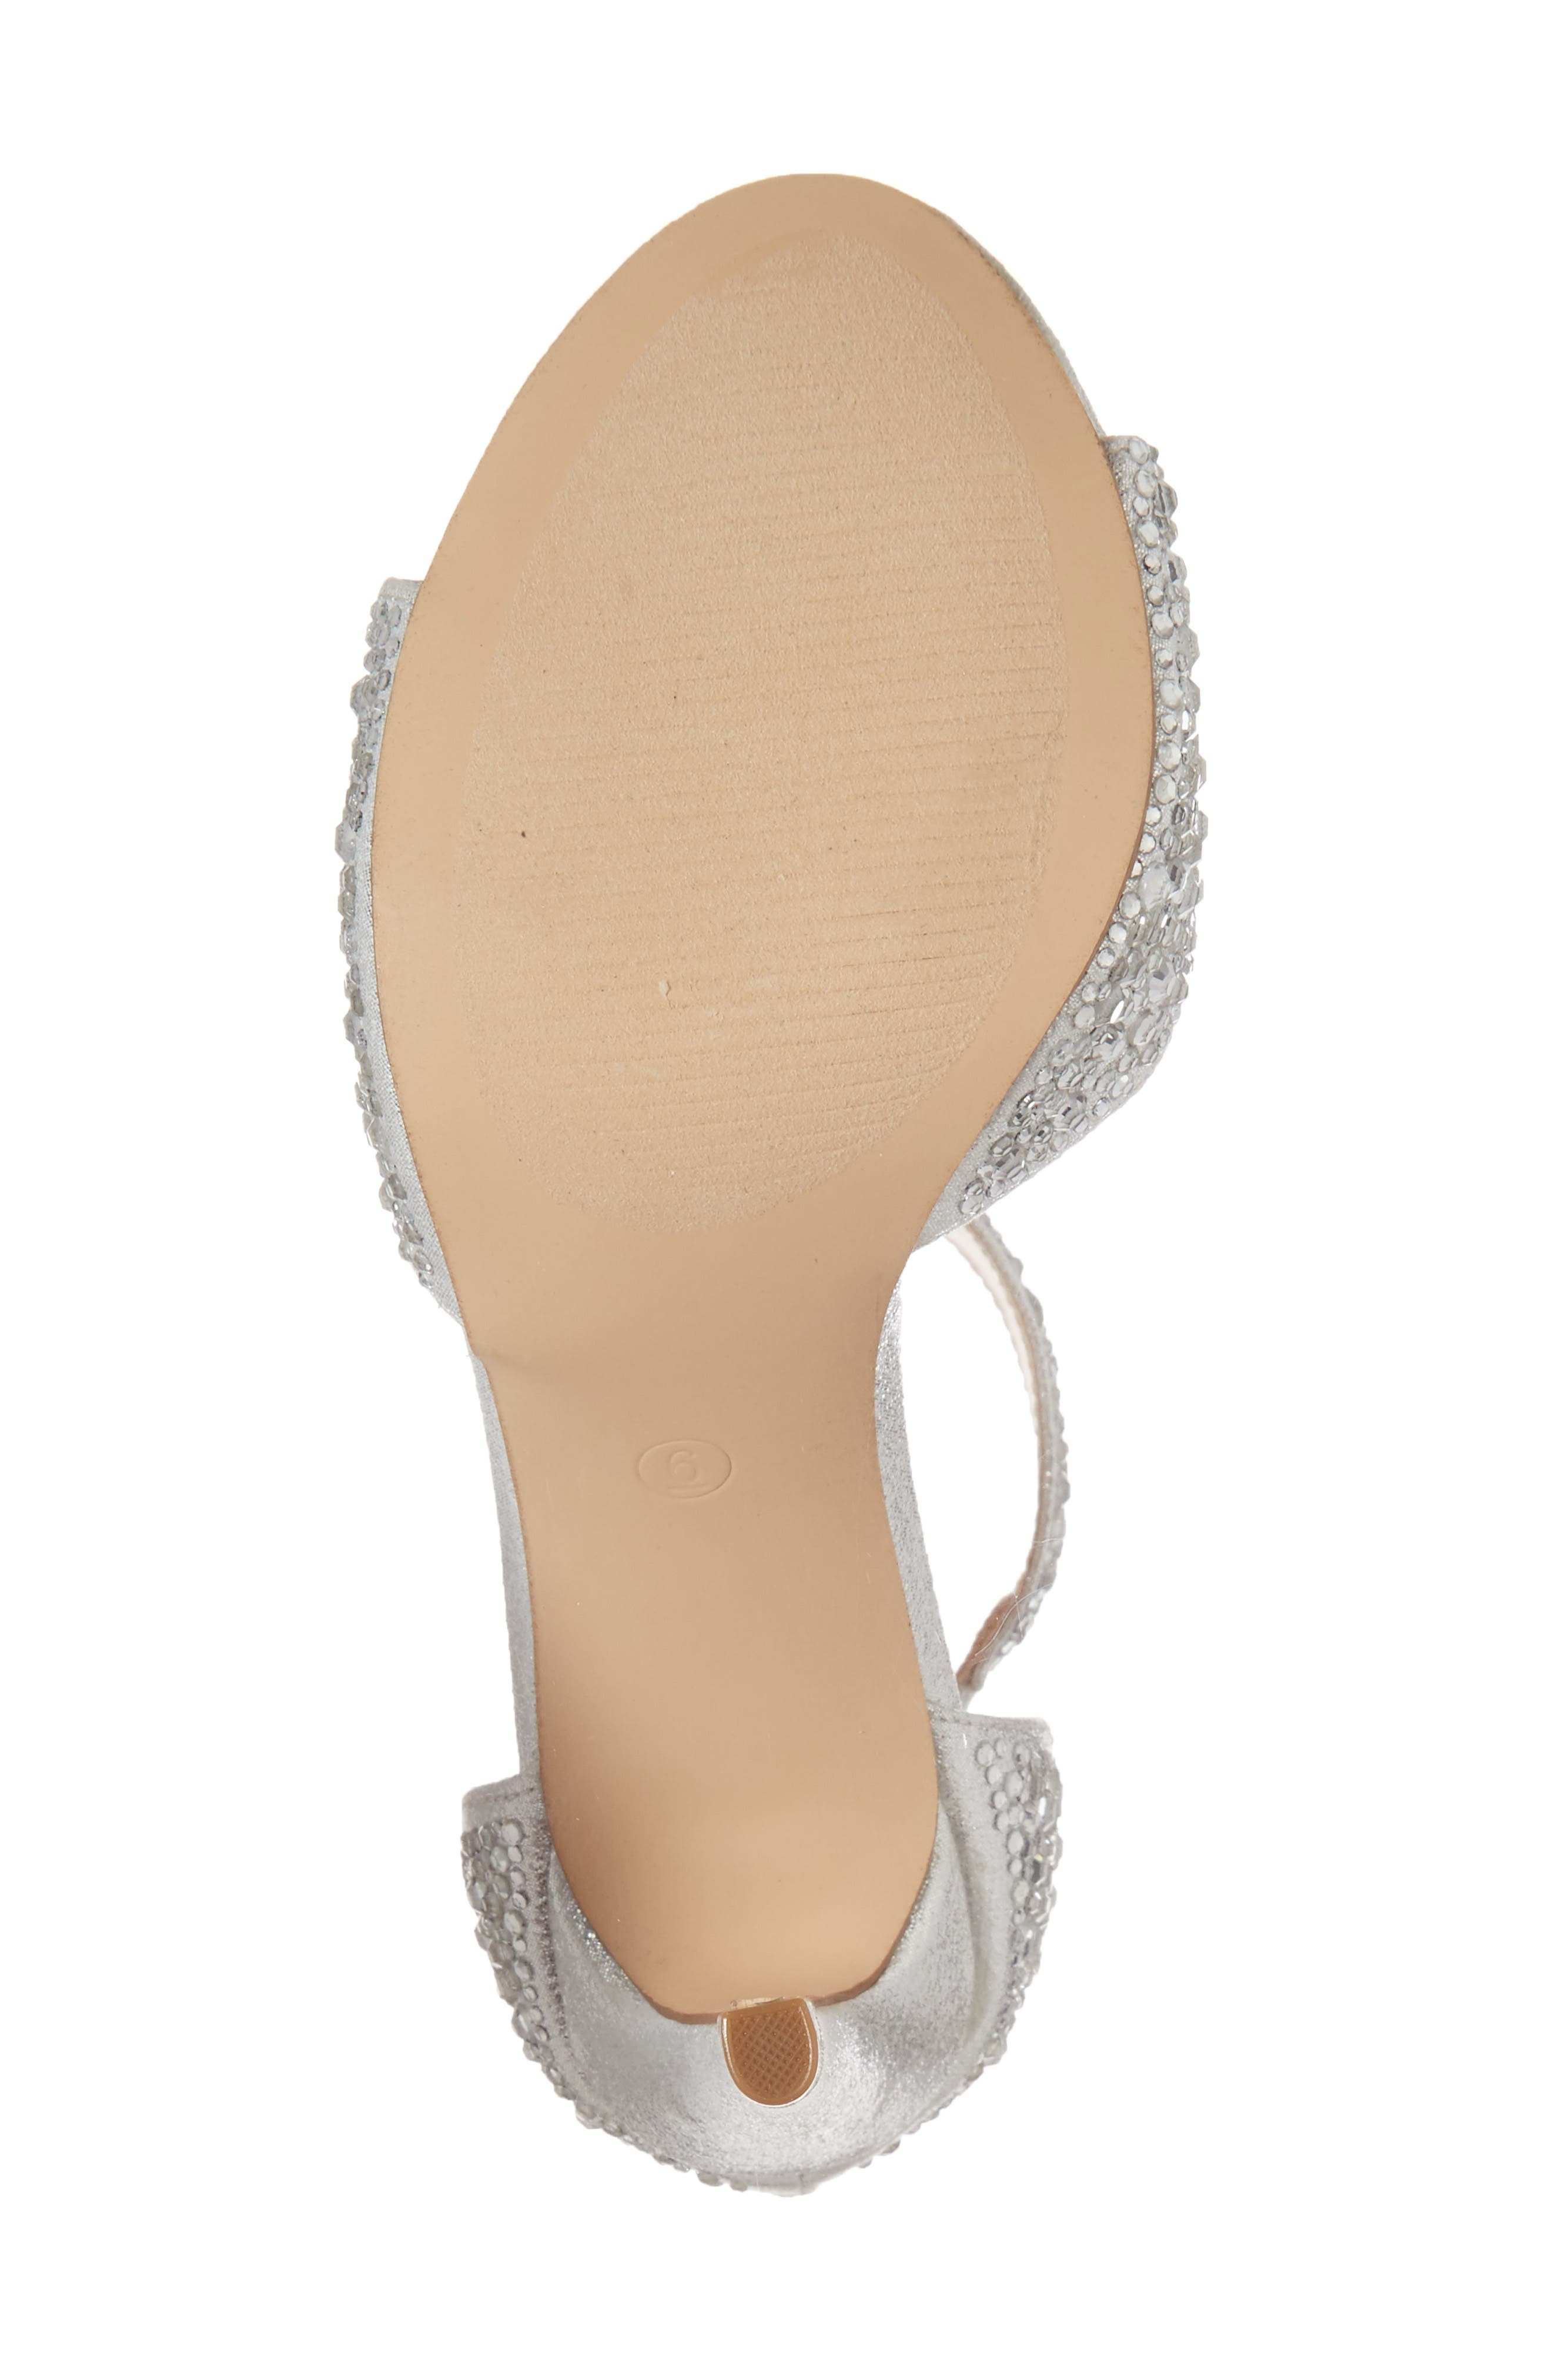 Ina Crystal Embellished Sandal,                             Alternate thumbnail 6, color,                             Silver